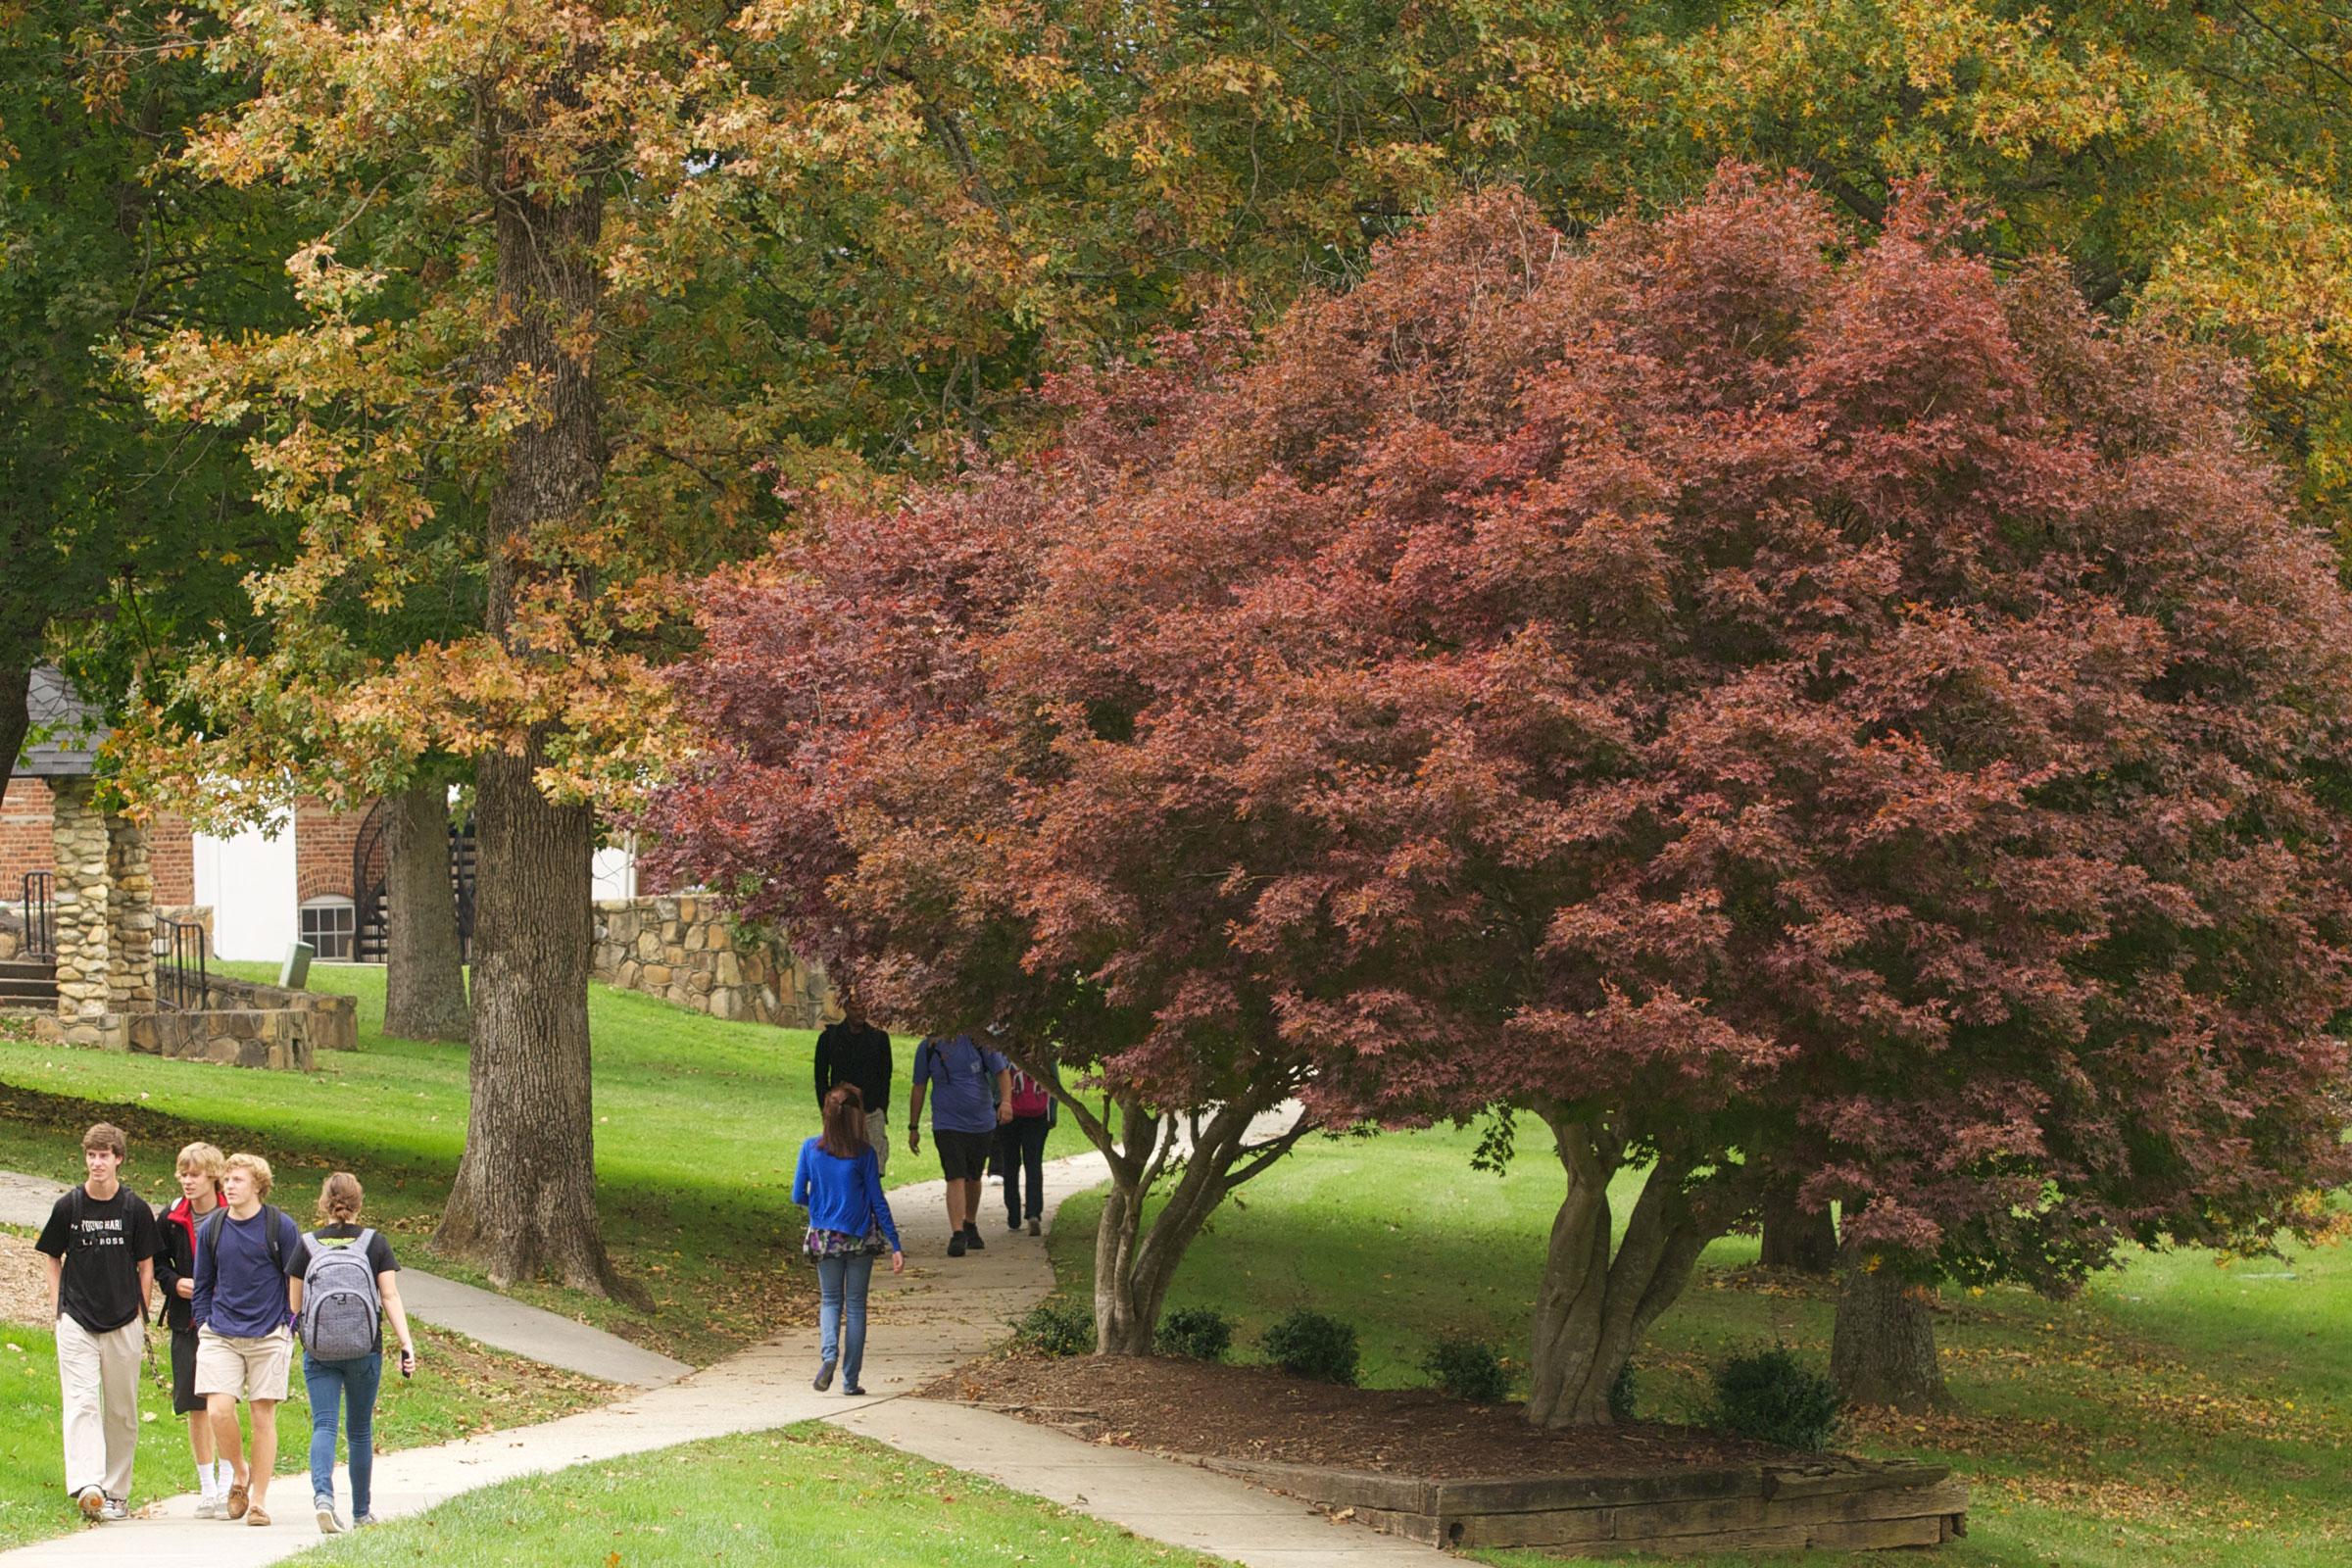 tree on campus lawn path